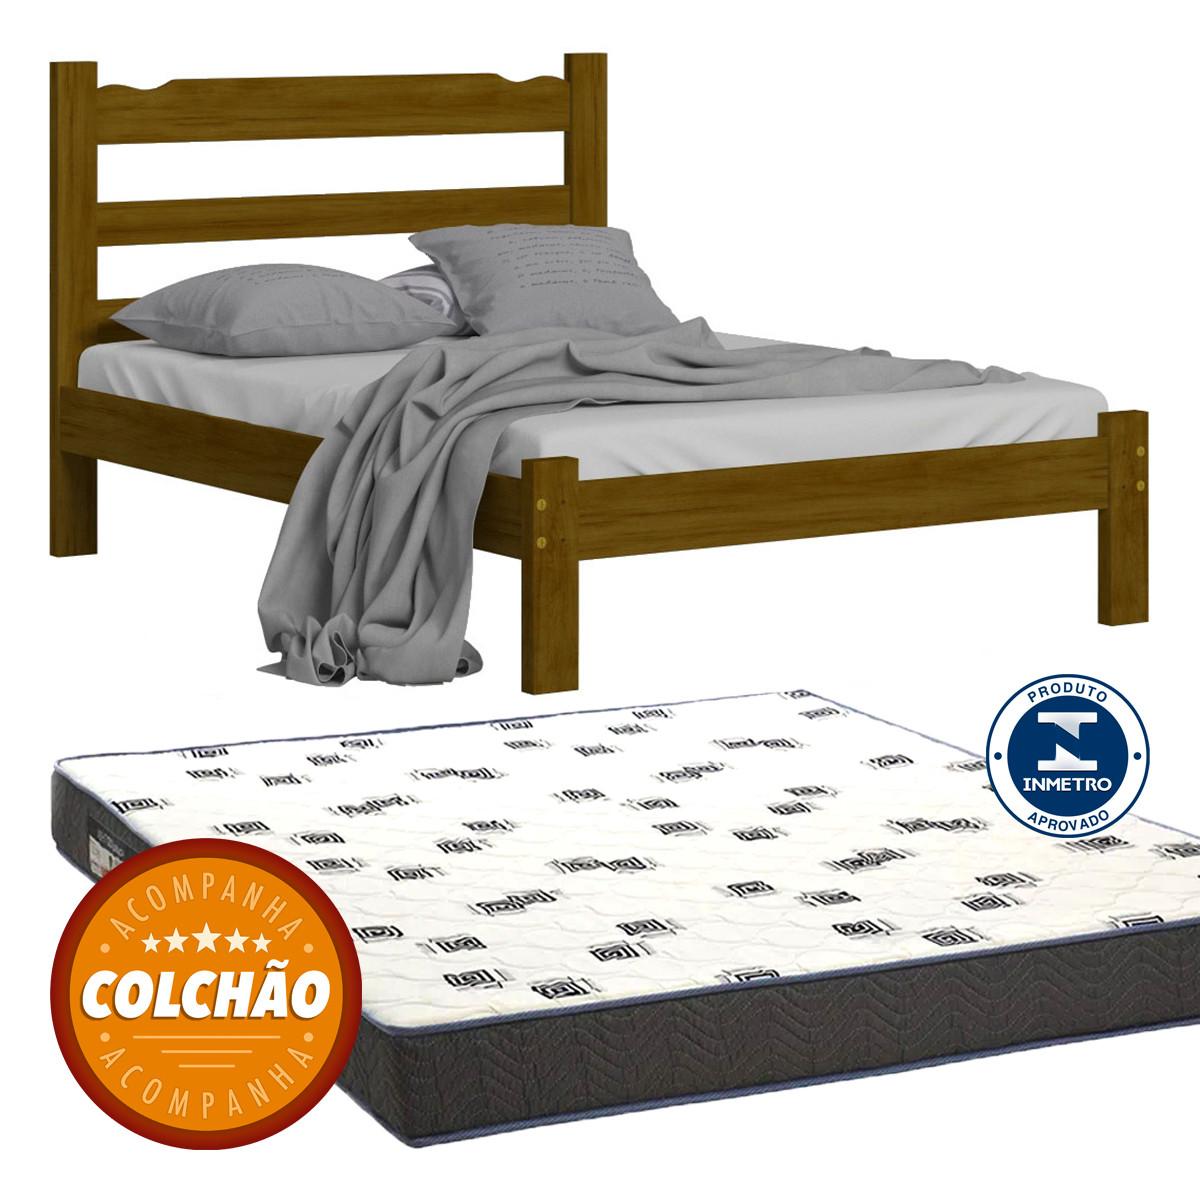 Cama Casal Cor Imbuia + Colchao